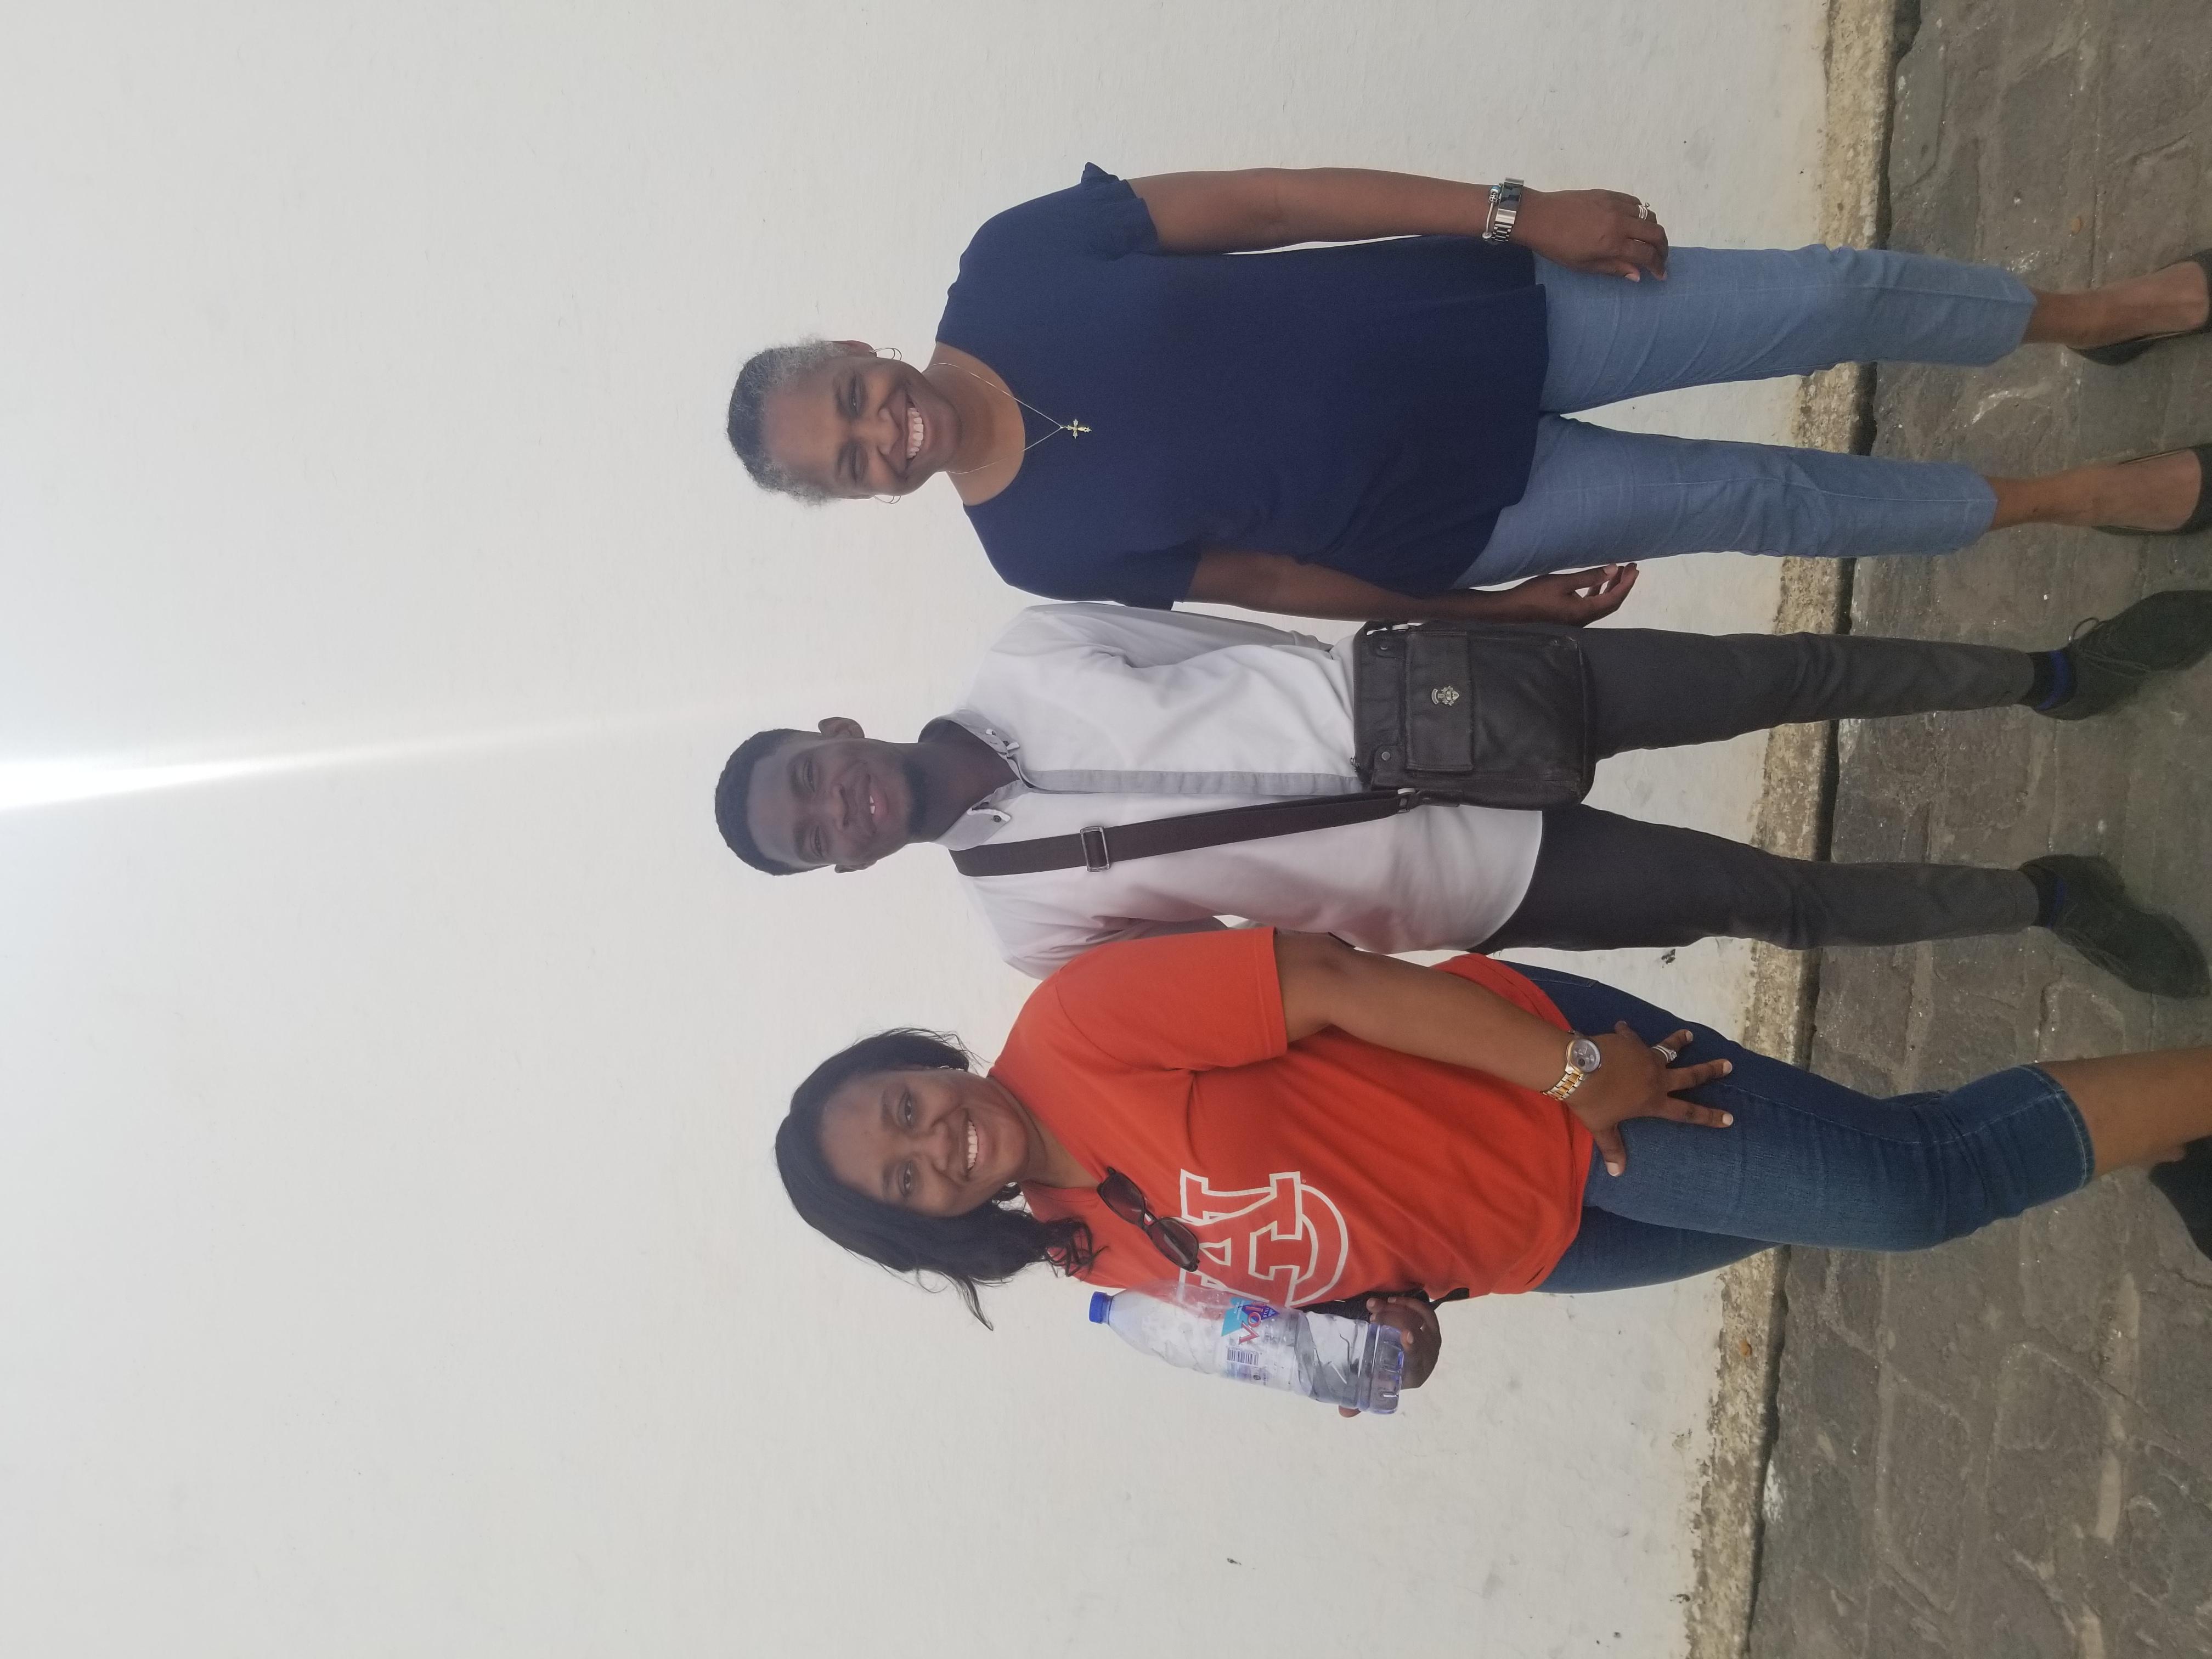 Drs. Quansah and Thomas meeting with Thomas Benson